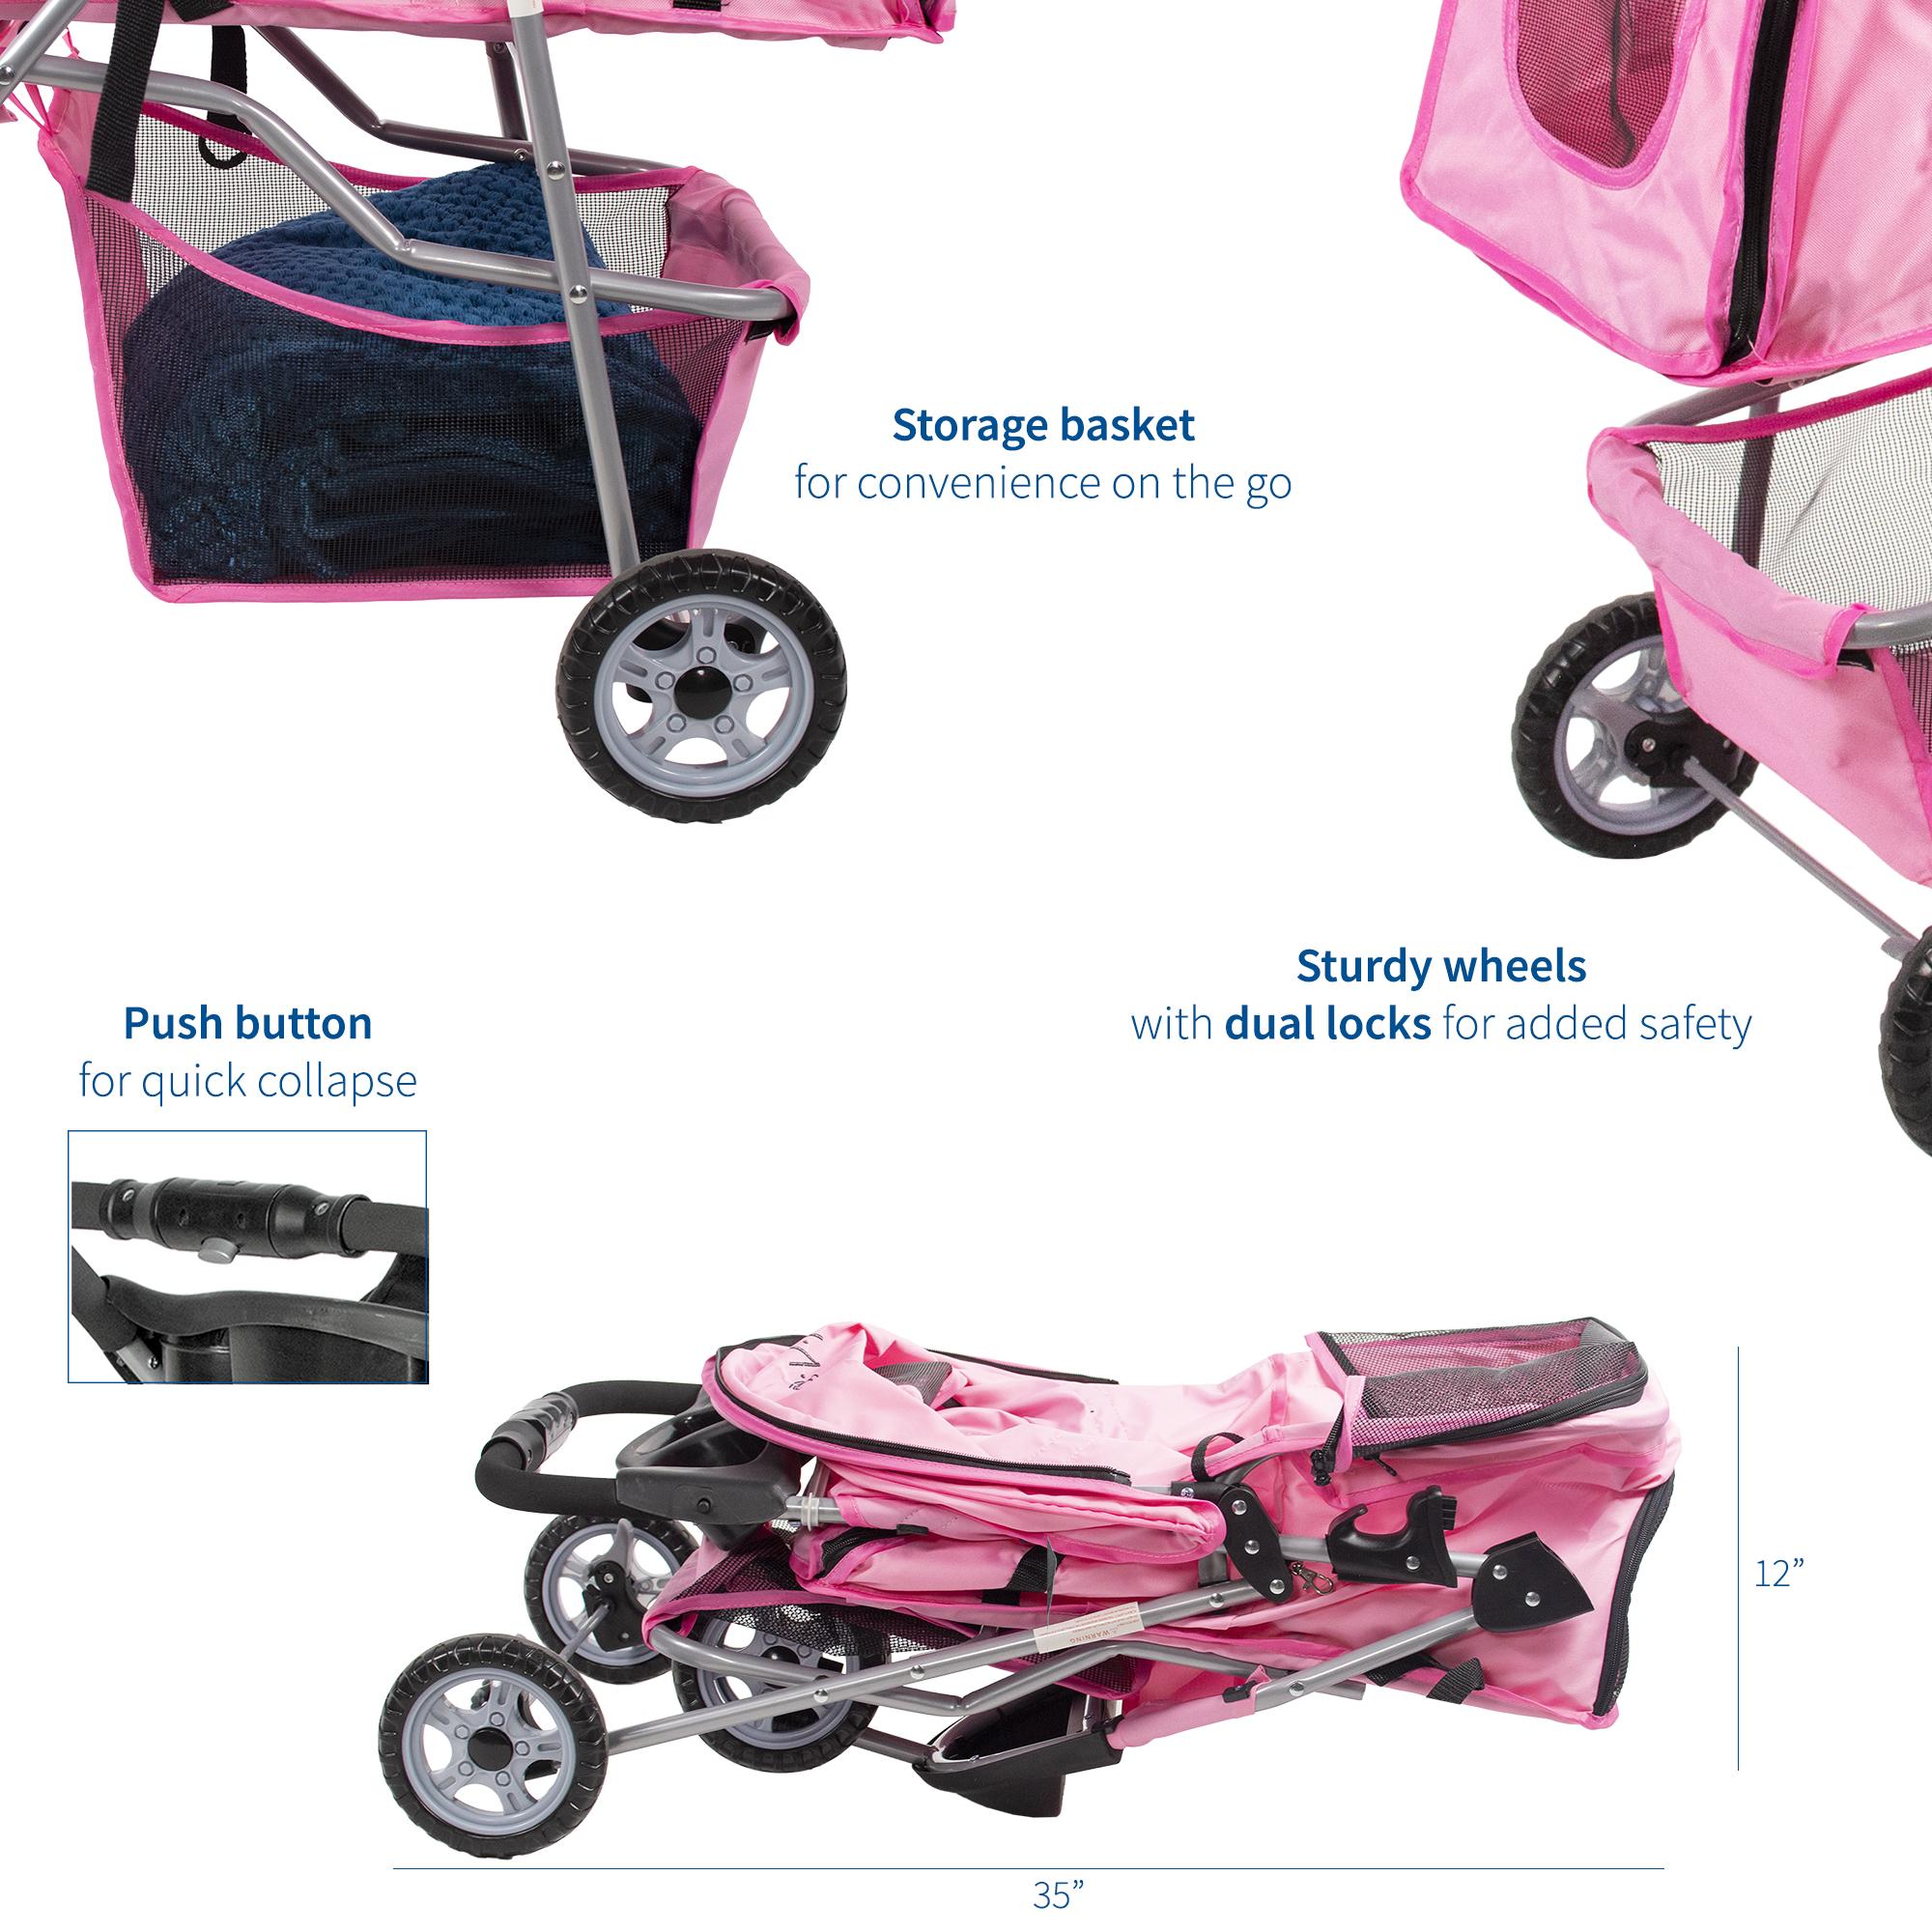 thumbnail 15 - VIVO Three Wheel Pet Stroller / Cat & Dog Foldable Carrier Strolling Cart